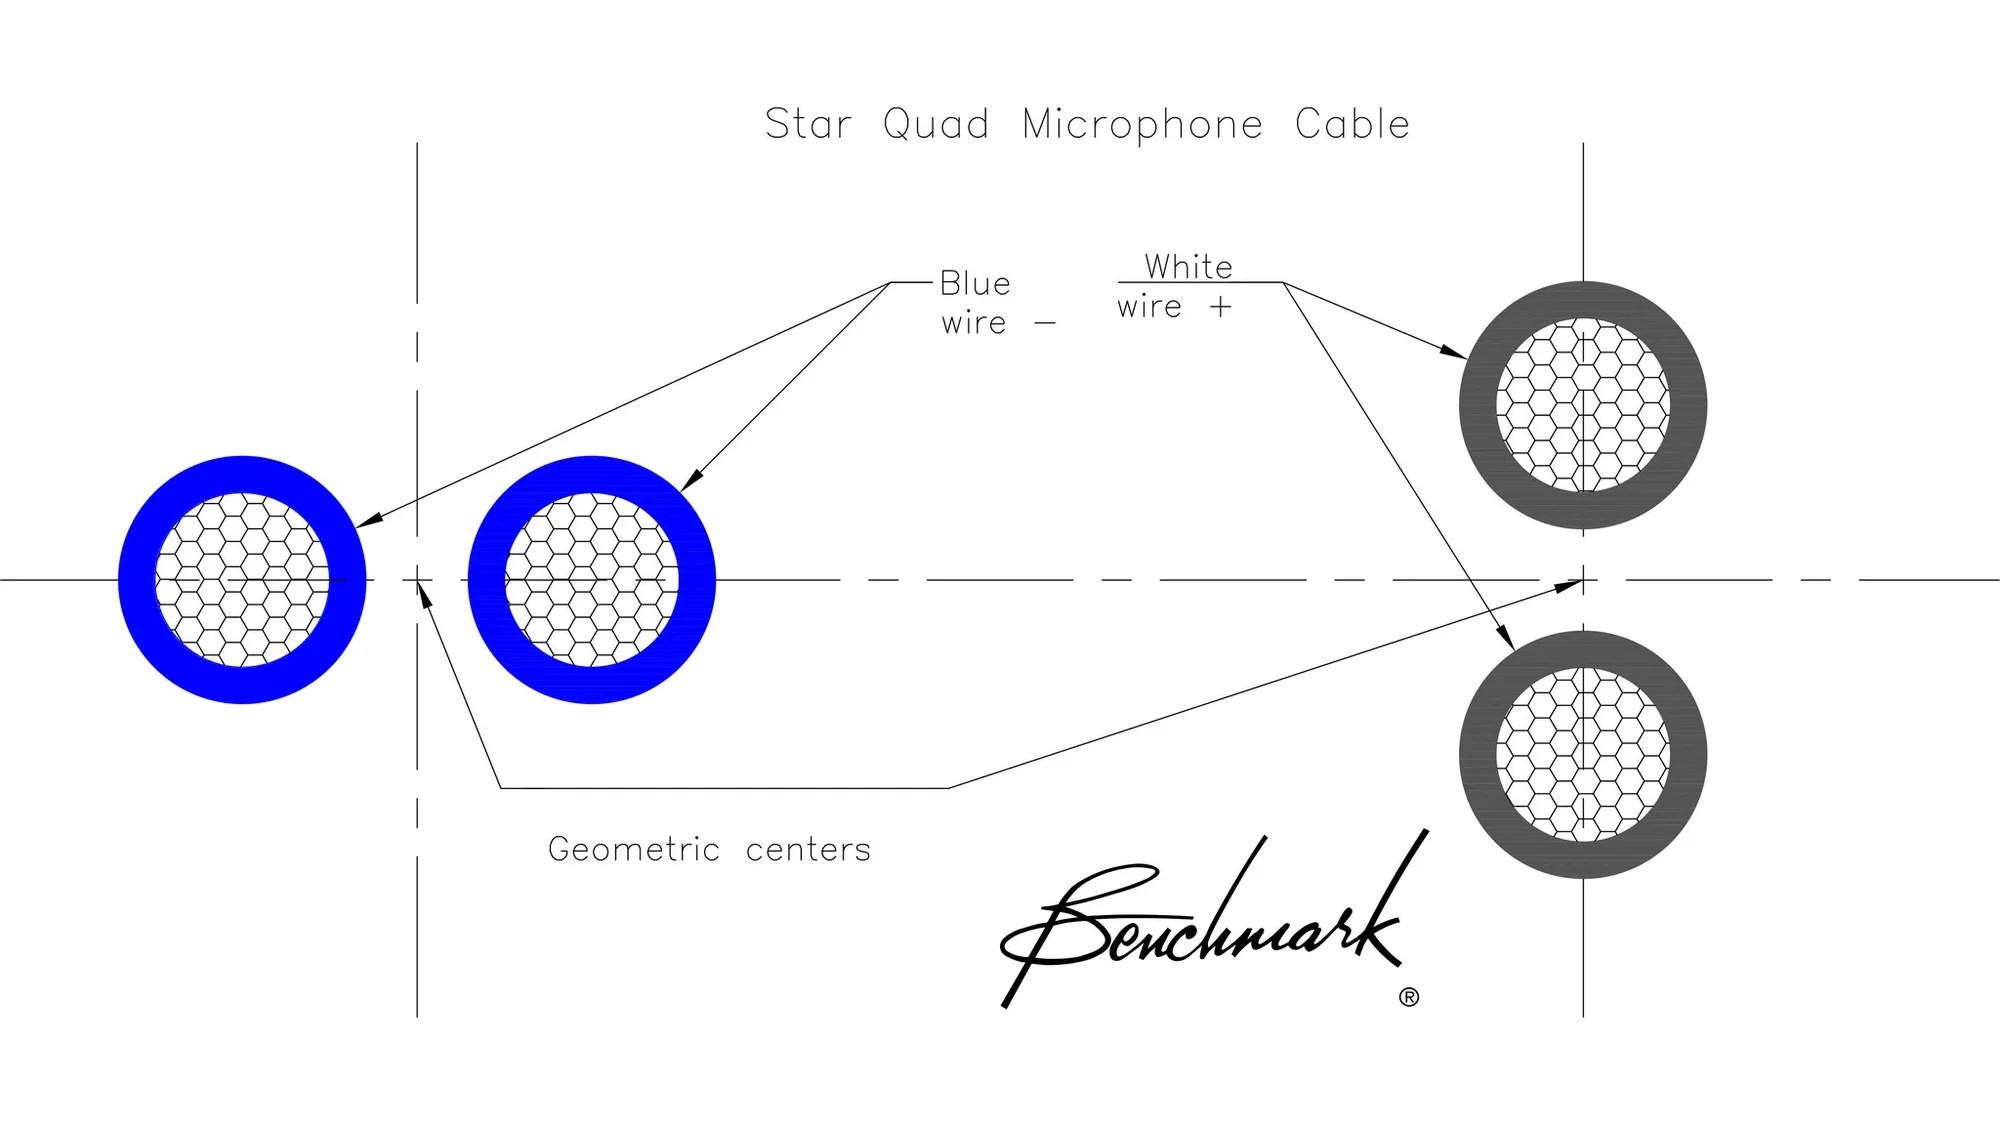 medium resolution of benchmark studio stage starquad xlr cable for analog audio